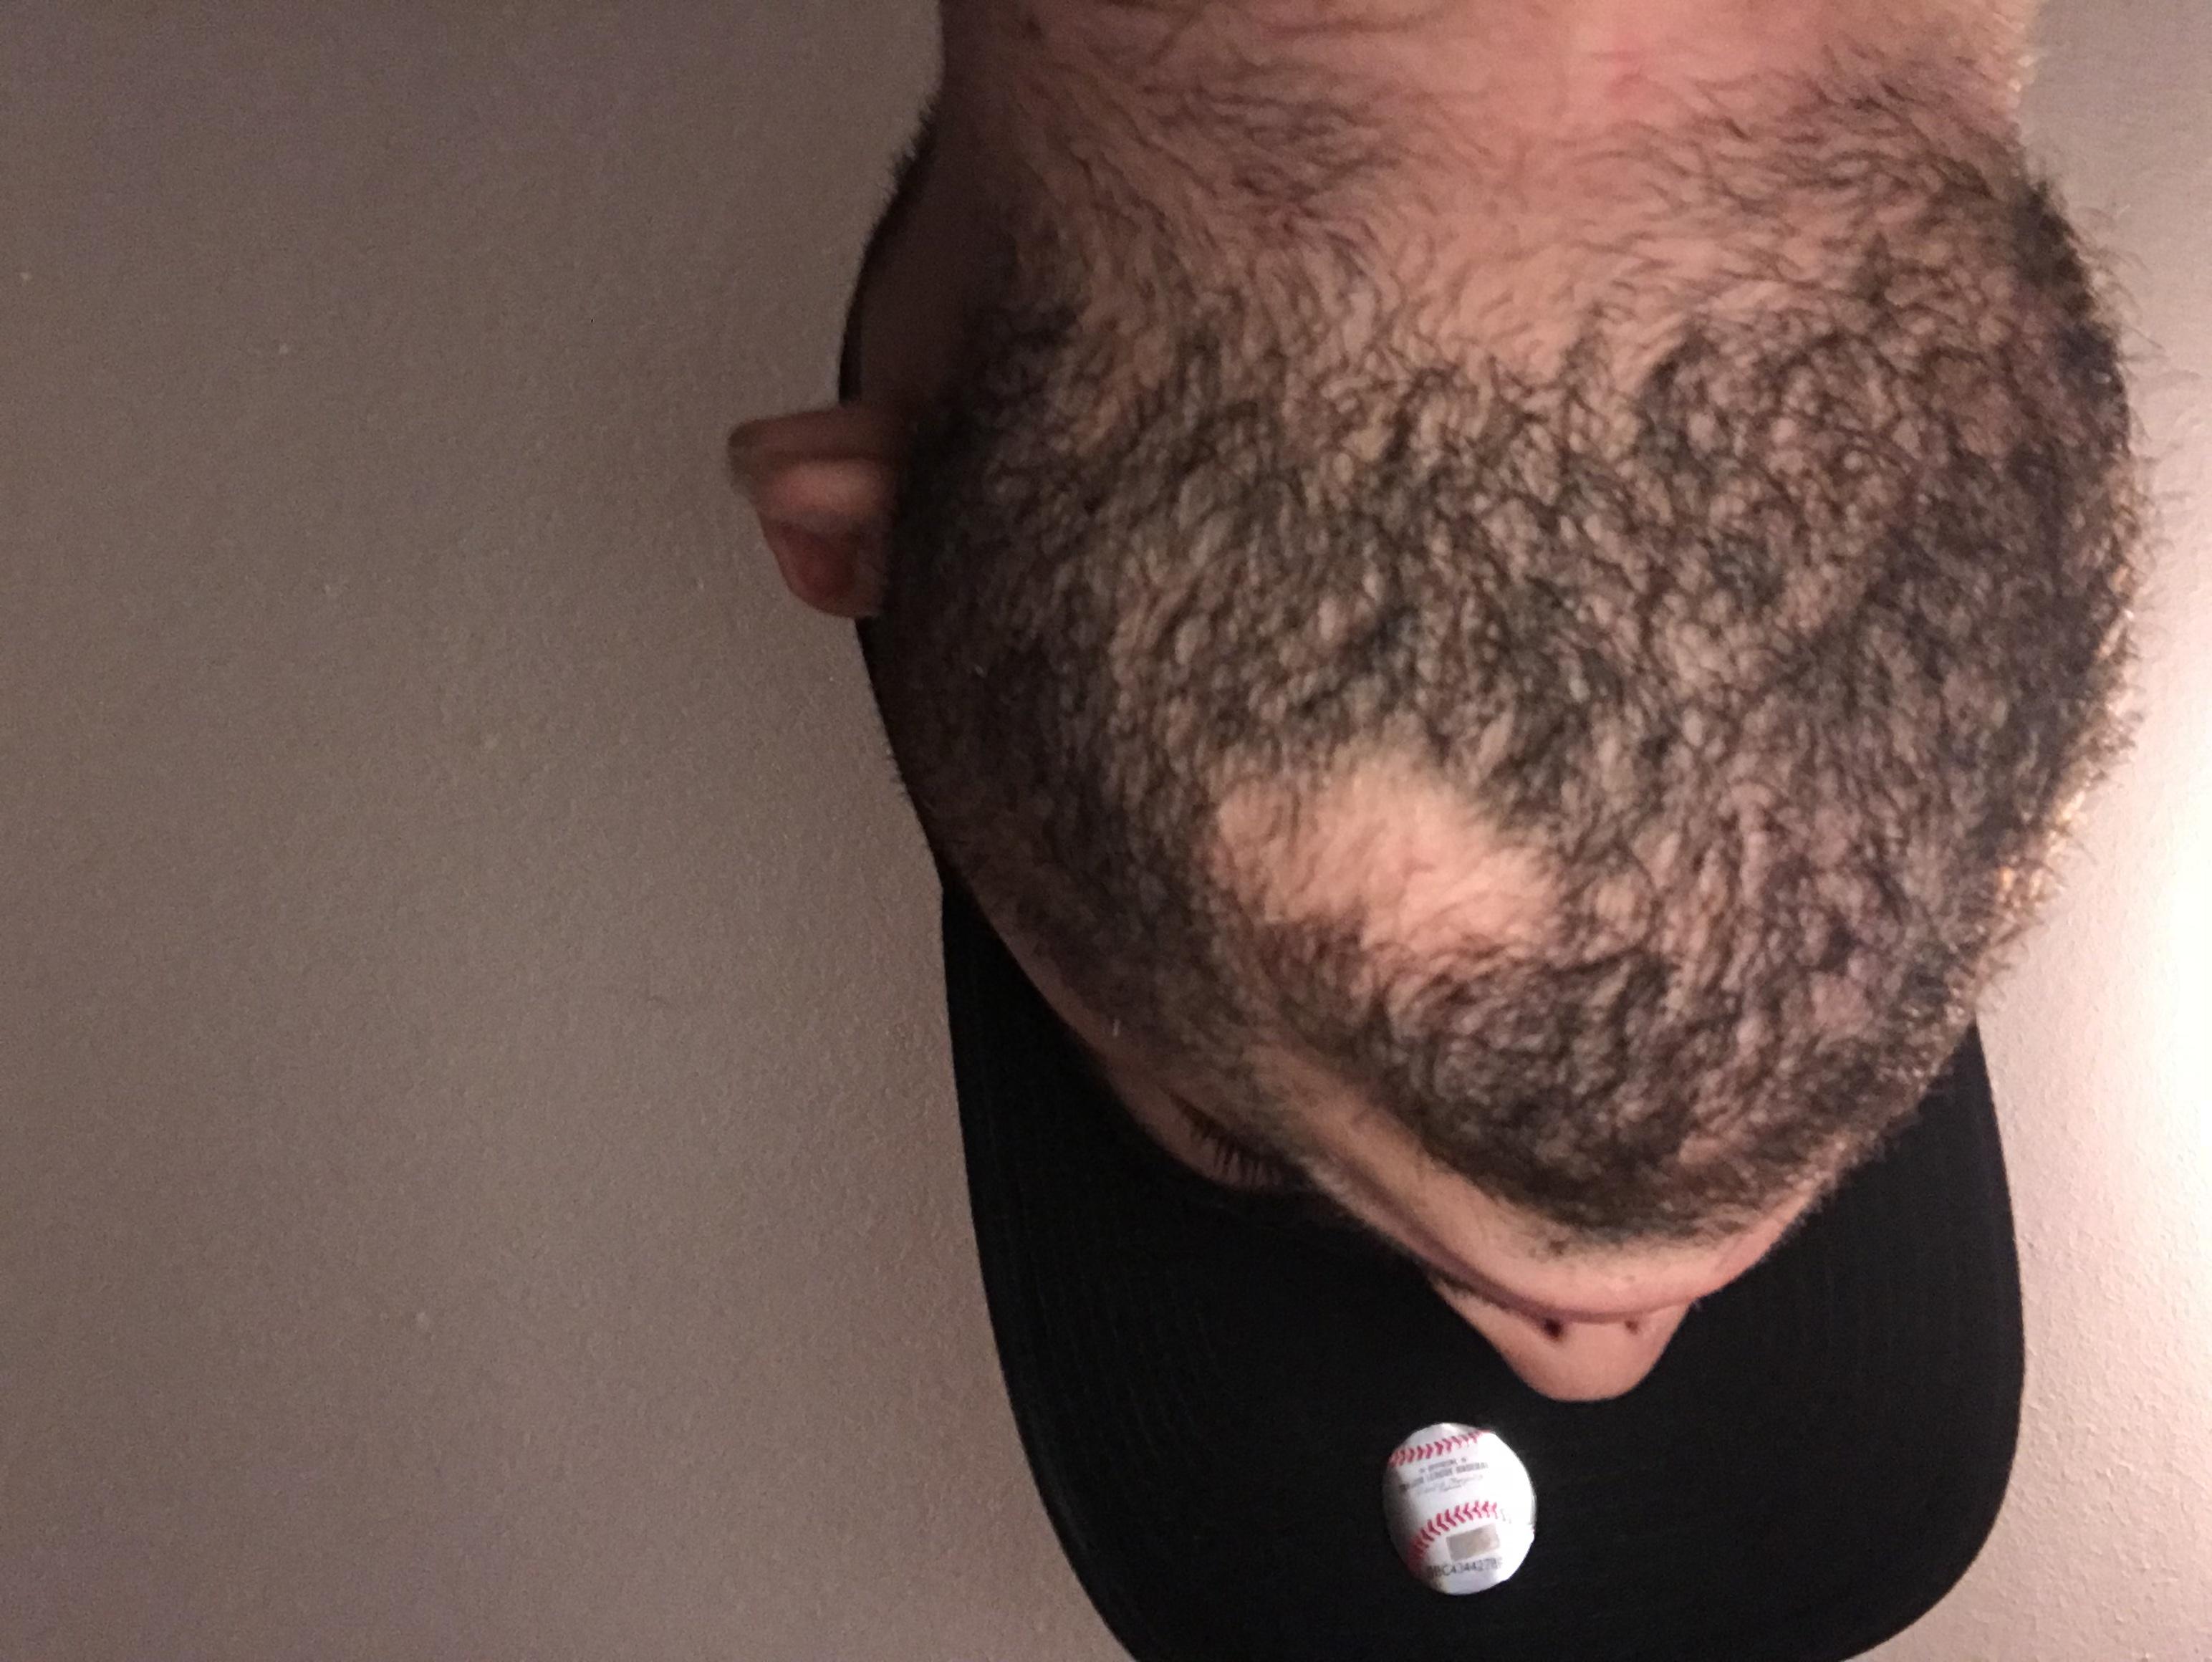 Hilfe!Kahle Stelle im Bart? (Haarausfall, Bartwuchs, Kahle